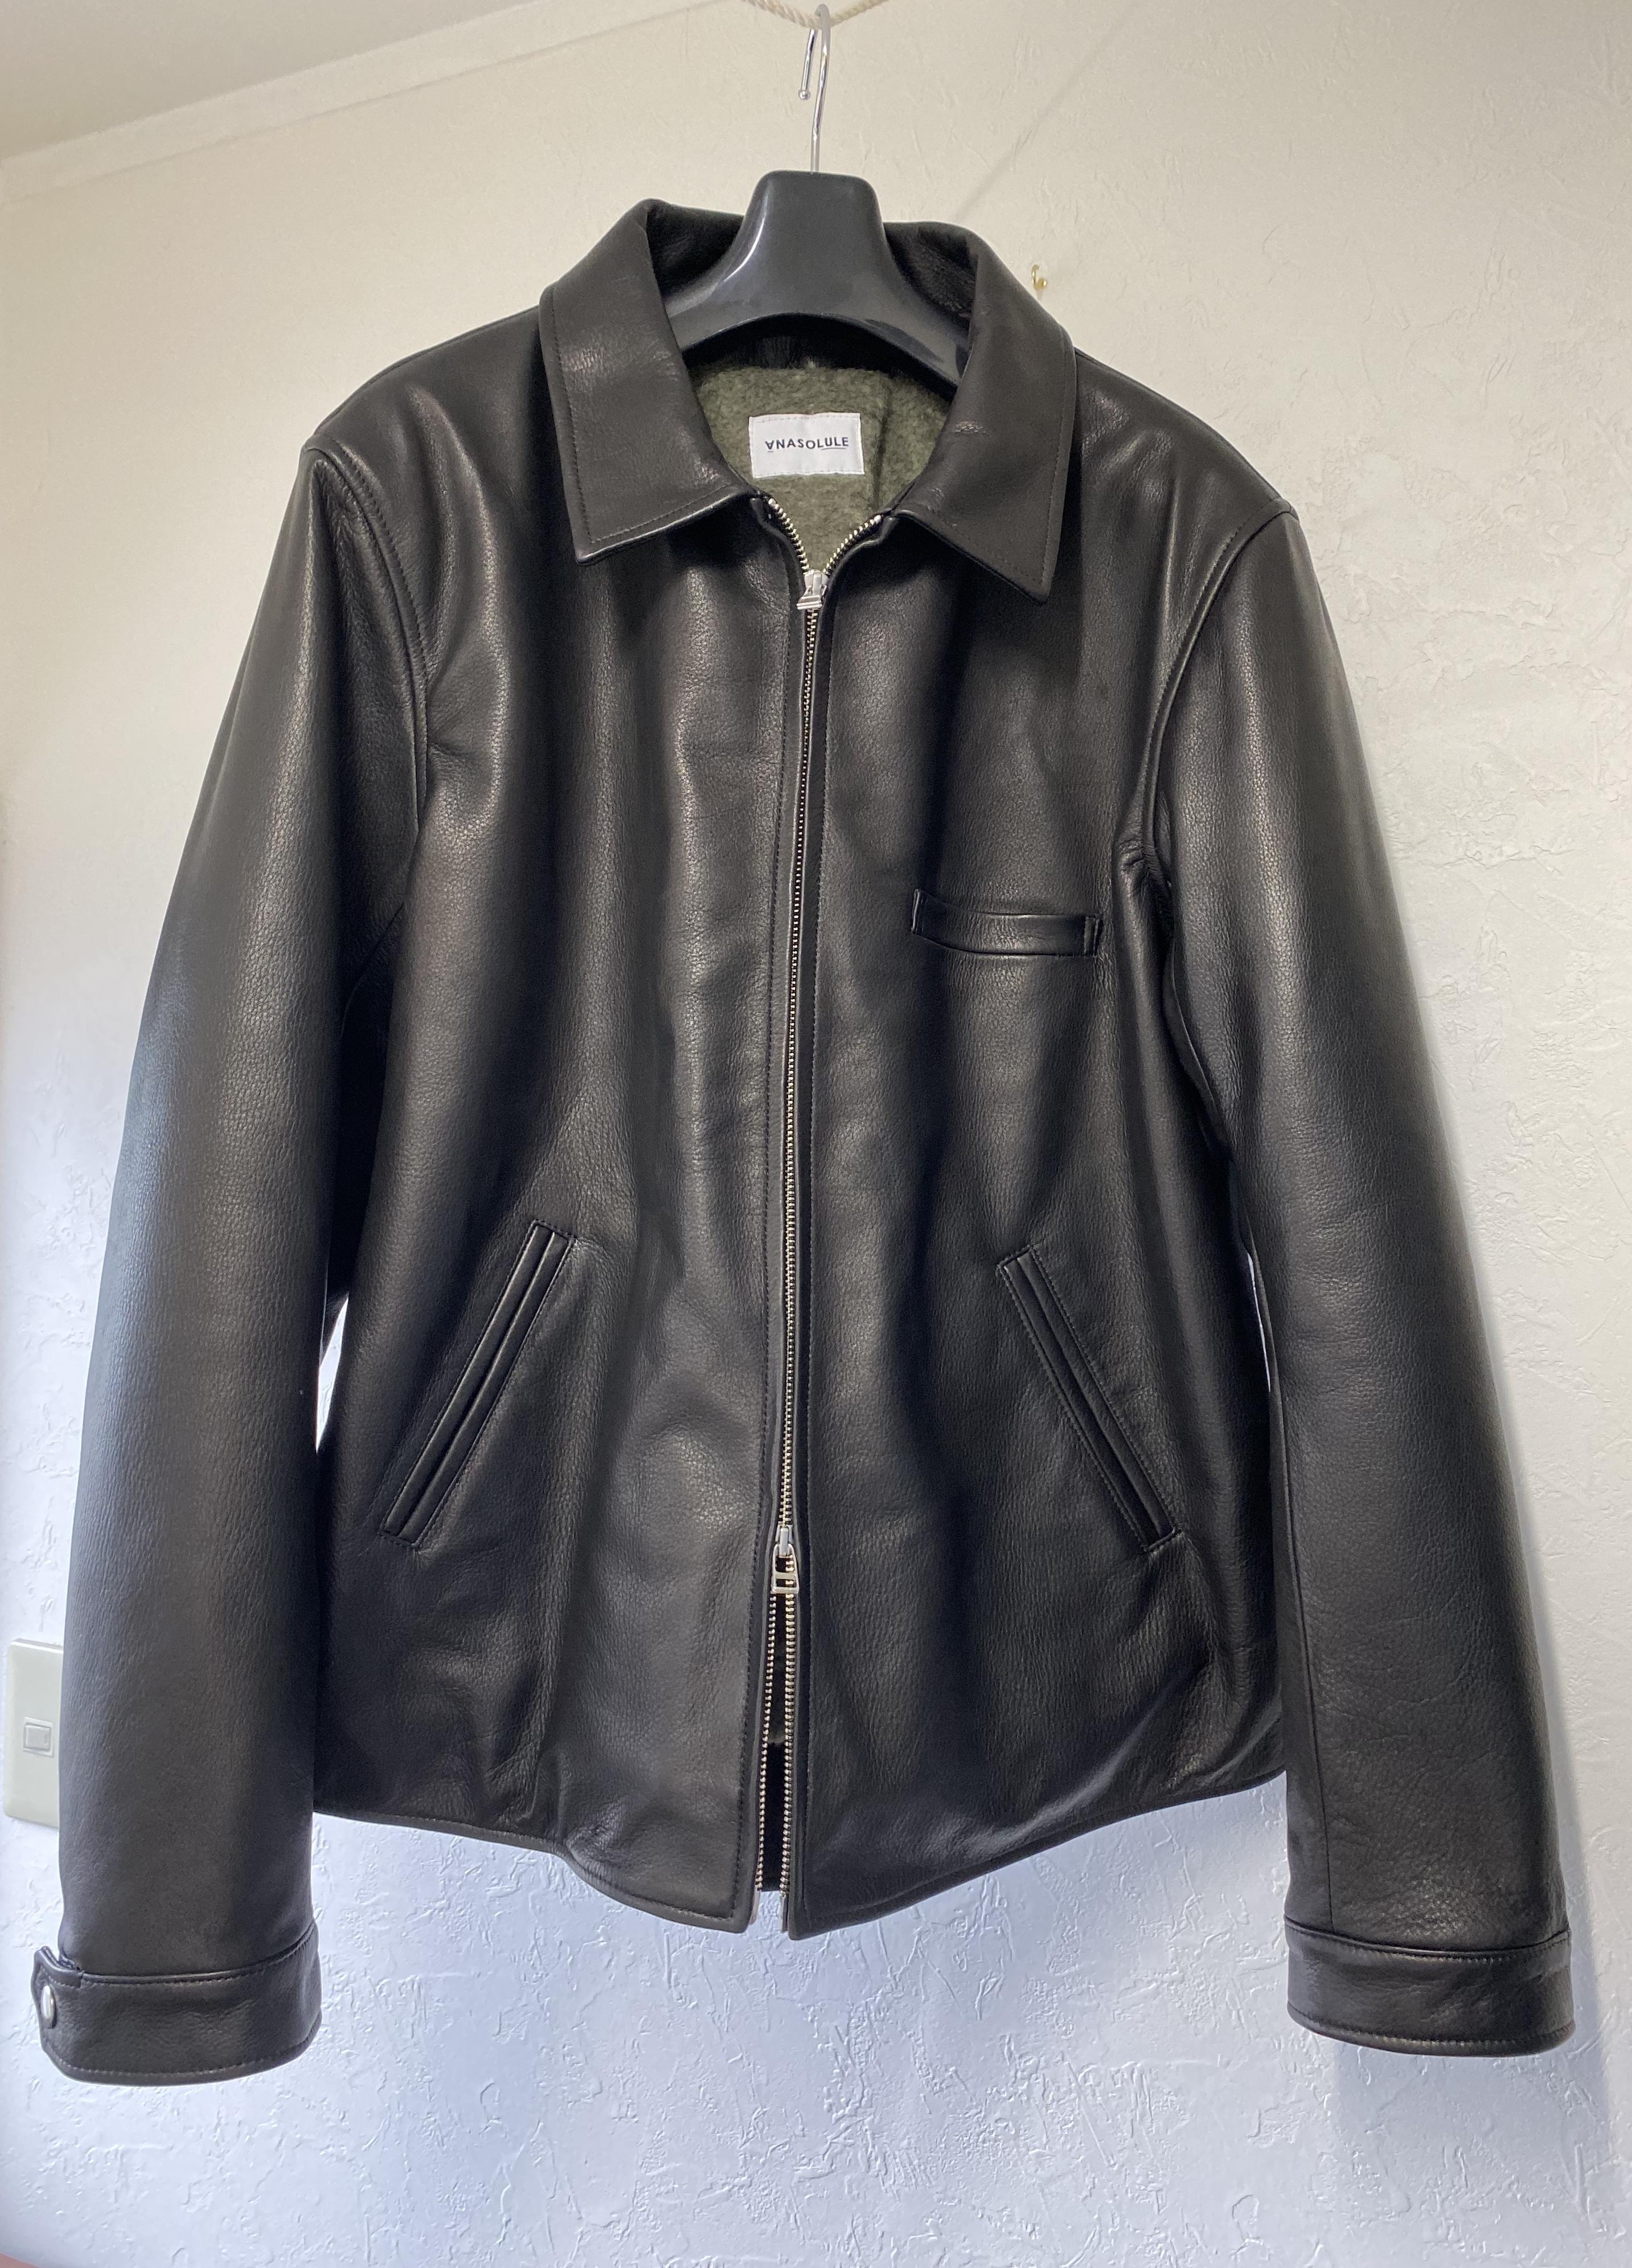 ANASOLULE  Single Leather Jacket